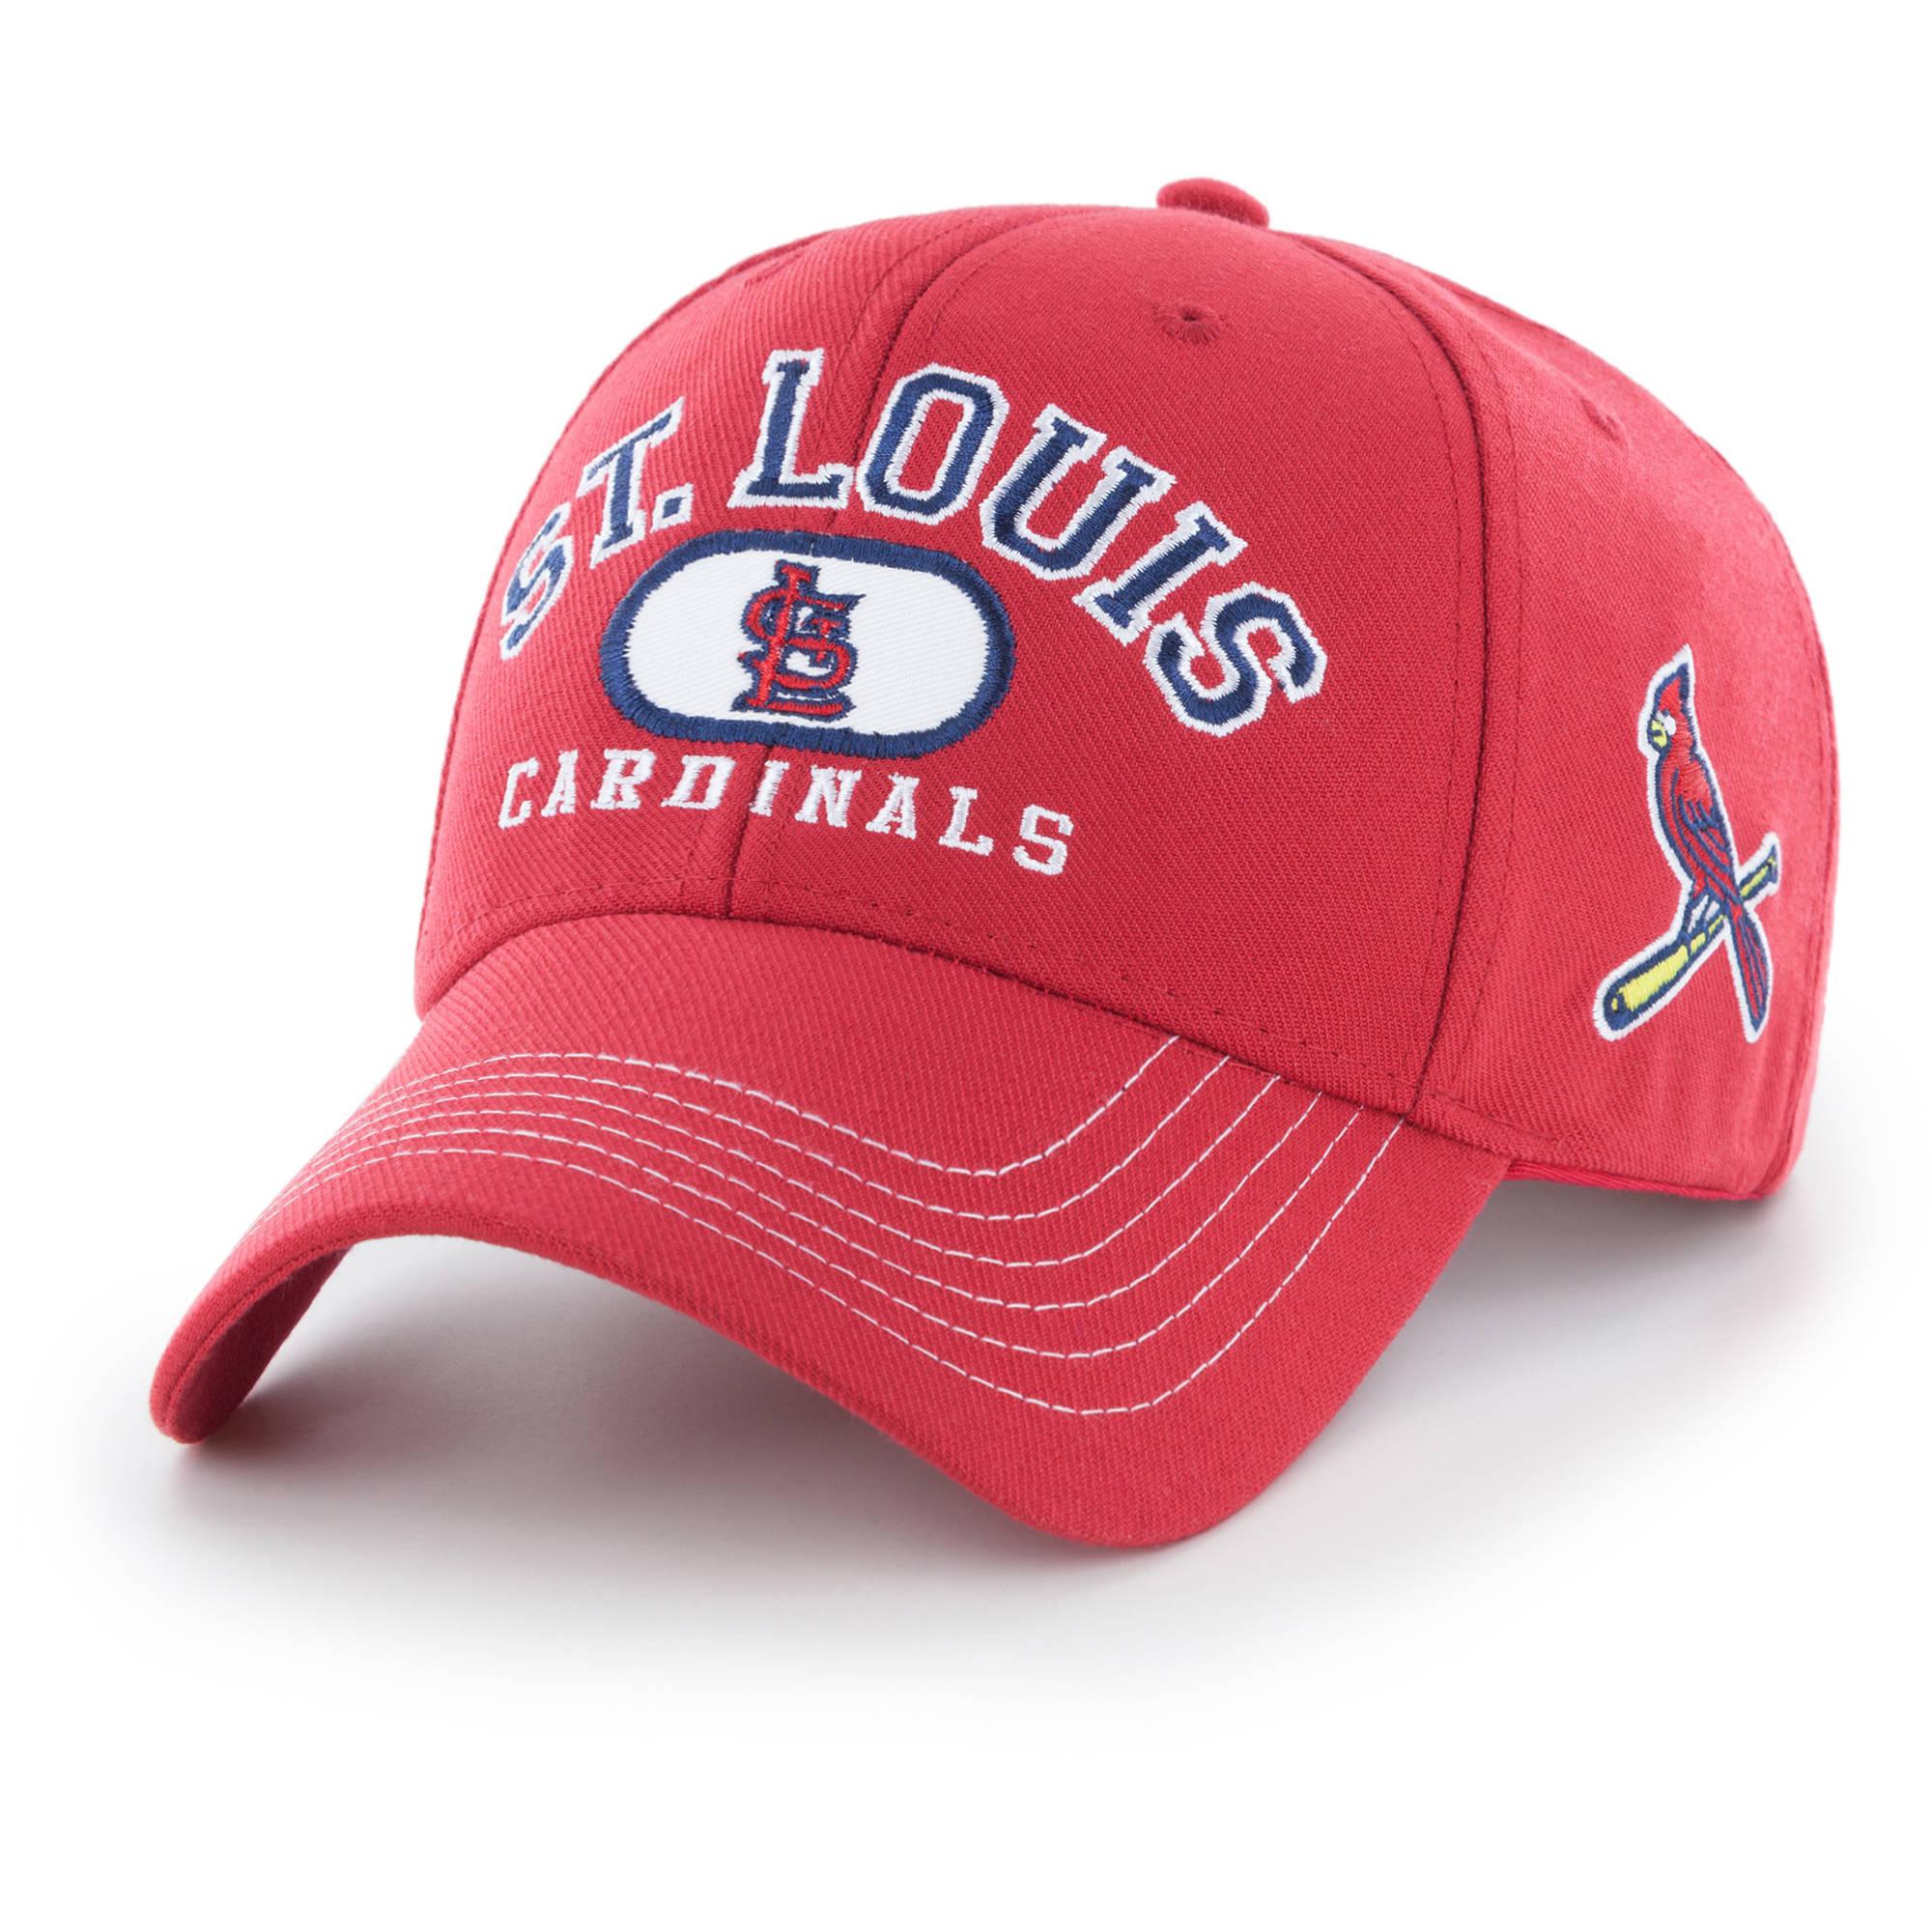 MLB St. Louis Cardinals Draft Cap / Hat by Fan Favorite